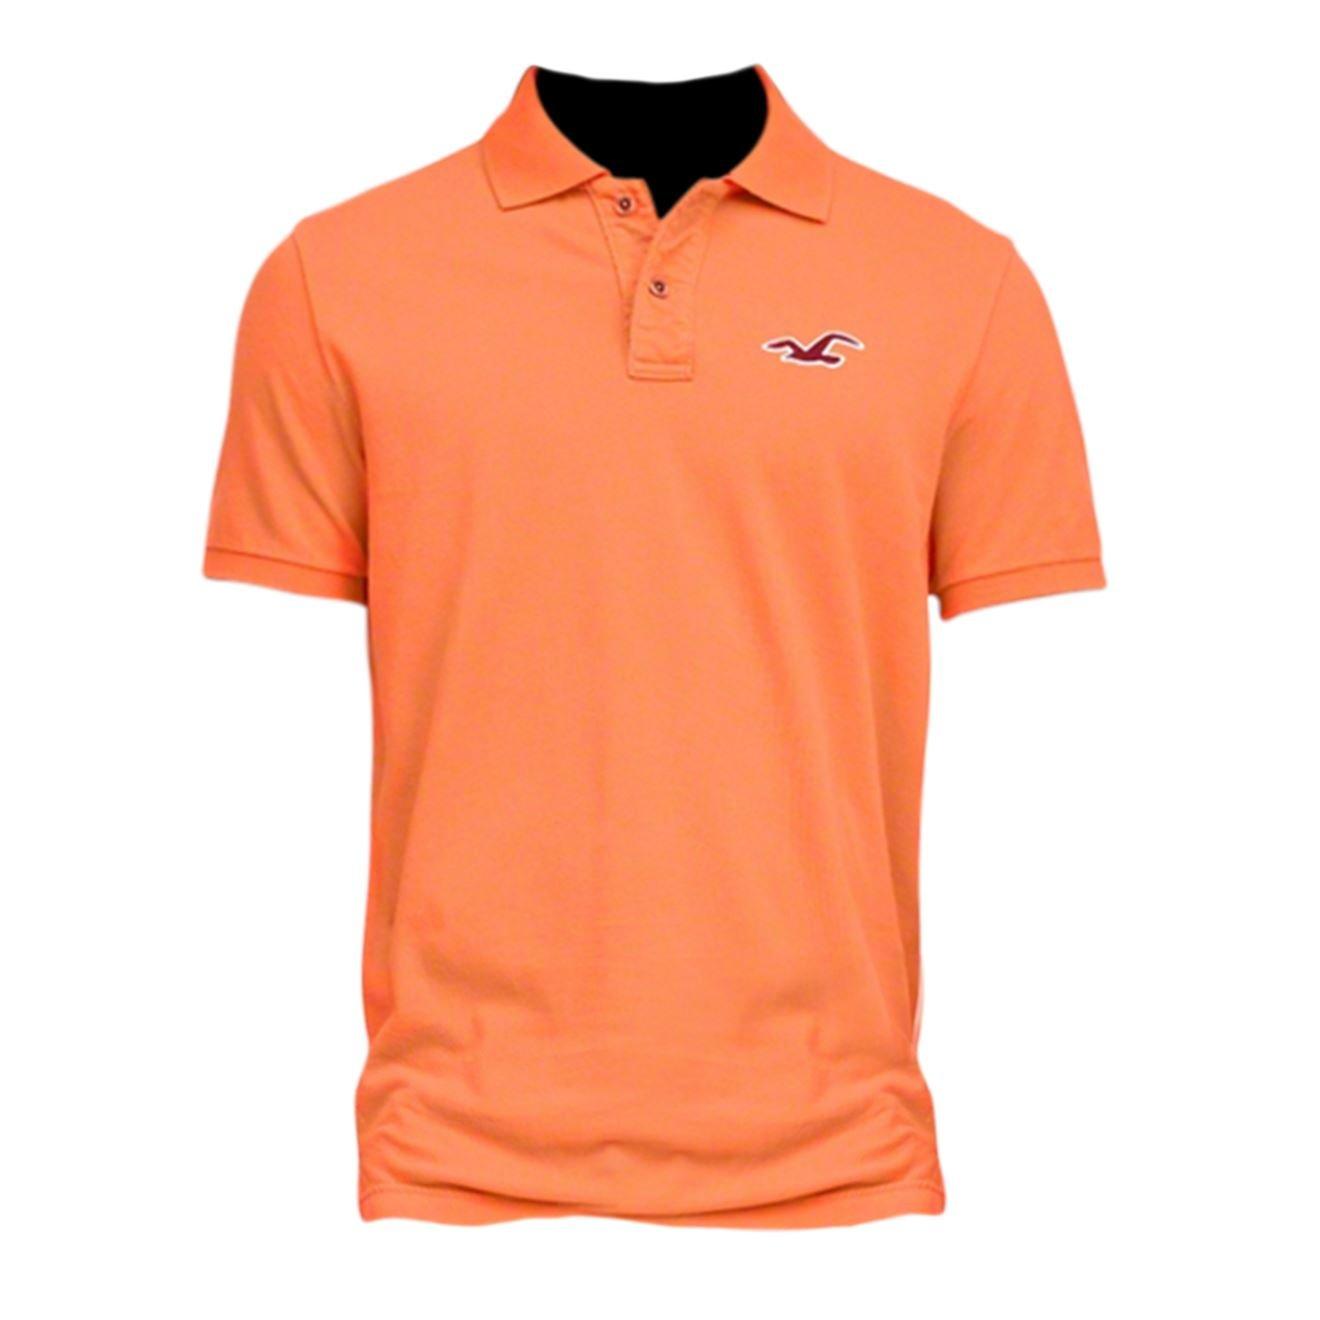 Hollister hombre contraste icono polo Shirt Tee Naranja naranja X ...